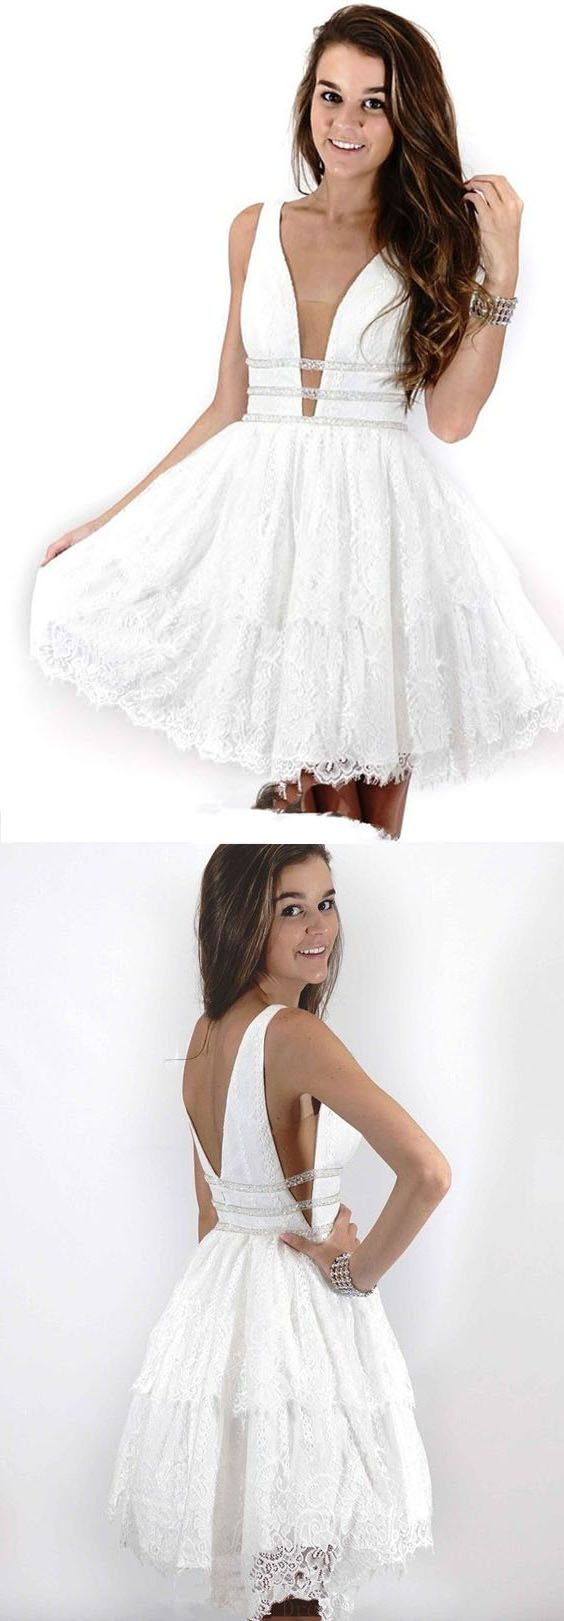 Lace white prom dresses lacewhitepromdresses prom dresses